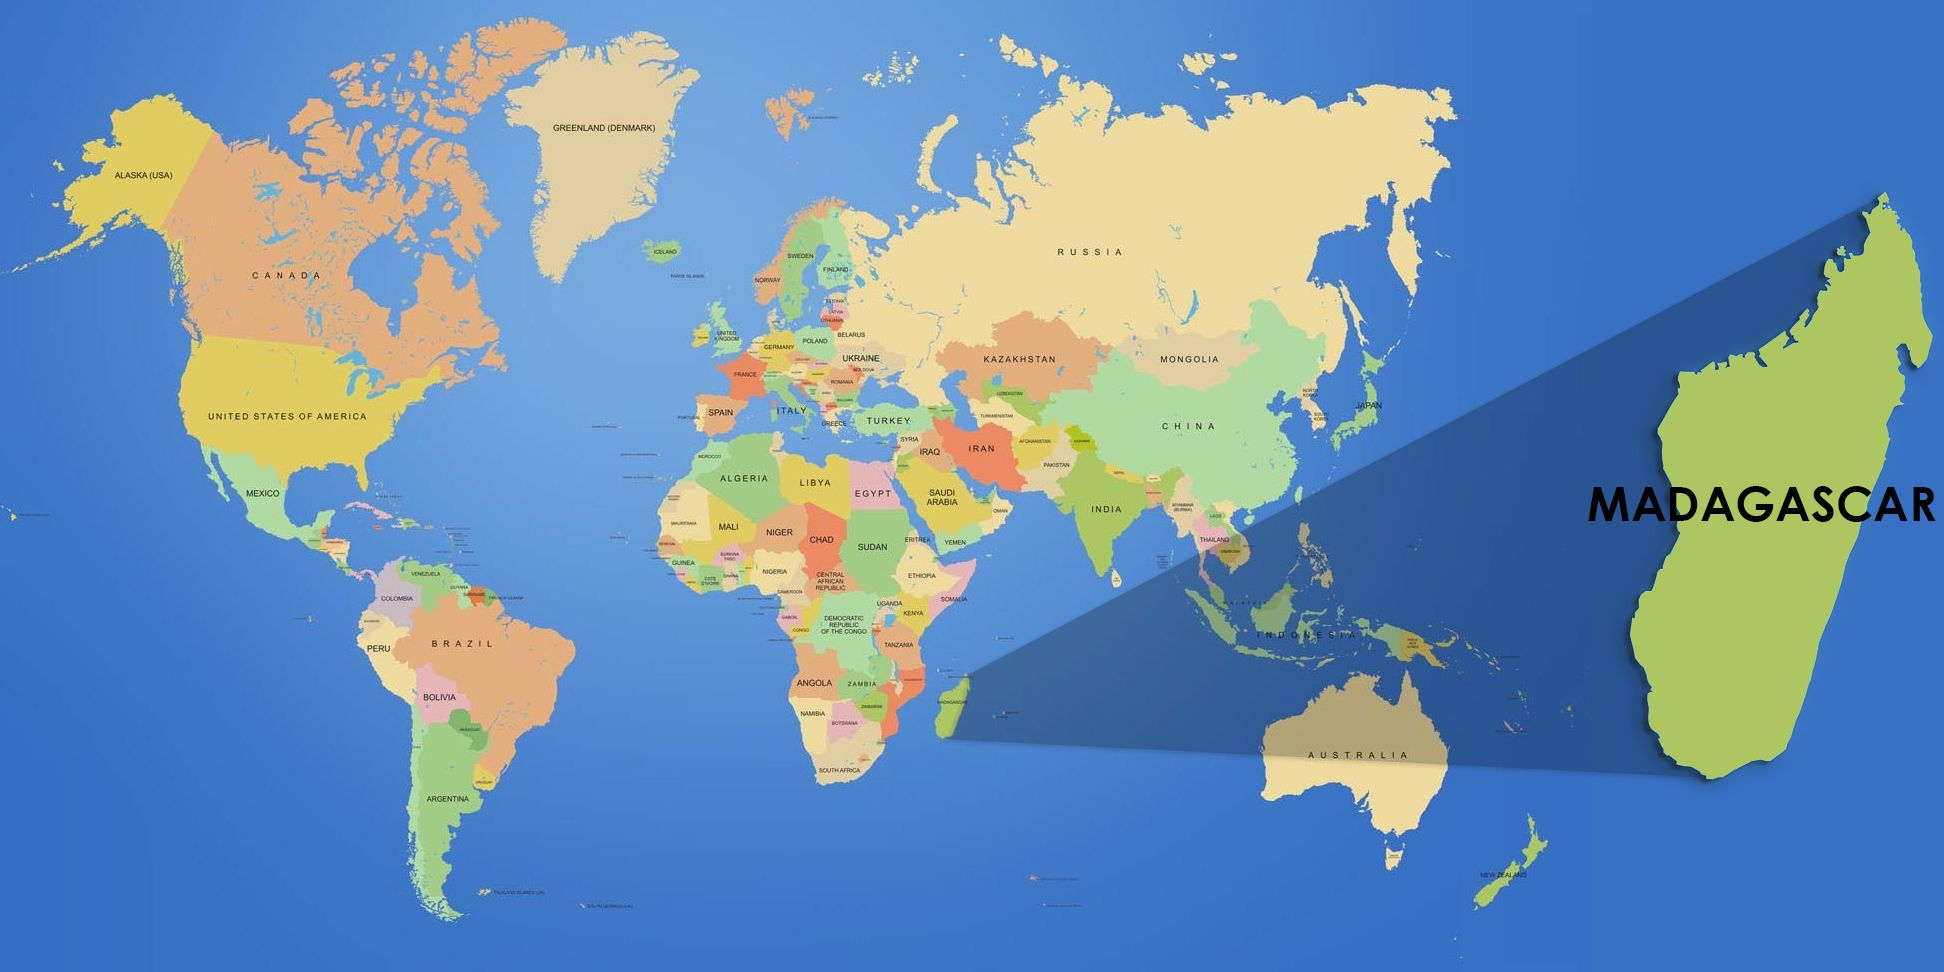 New Madagascar On World Map 3 | Madagascar | Map, Madagascar, Diagram